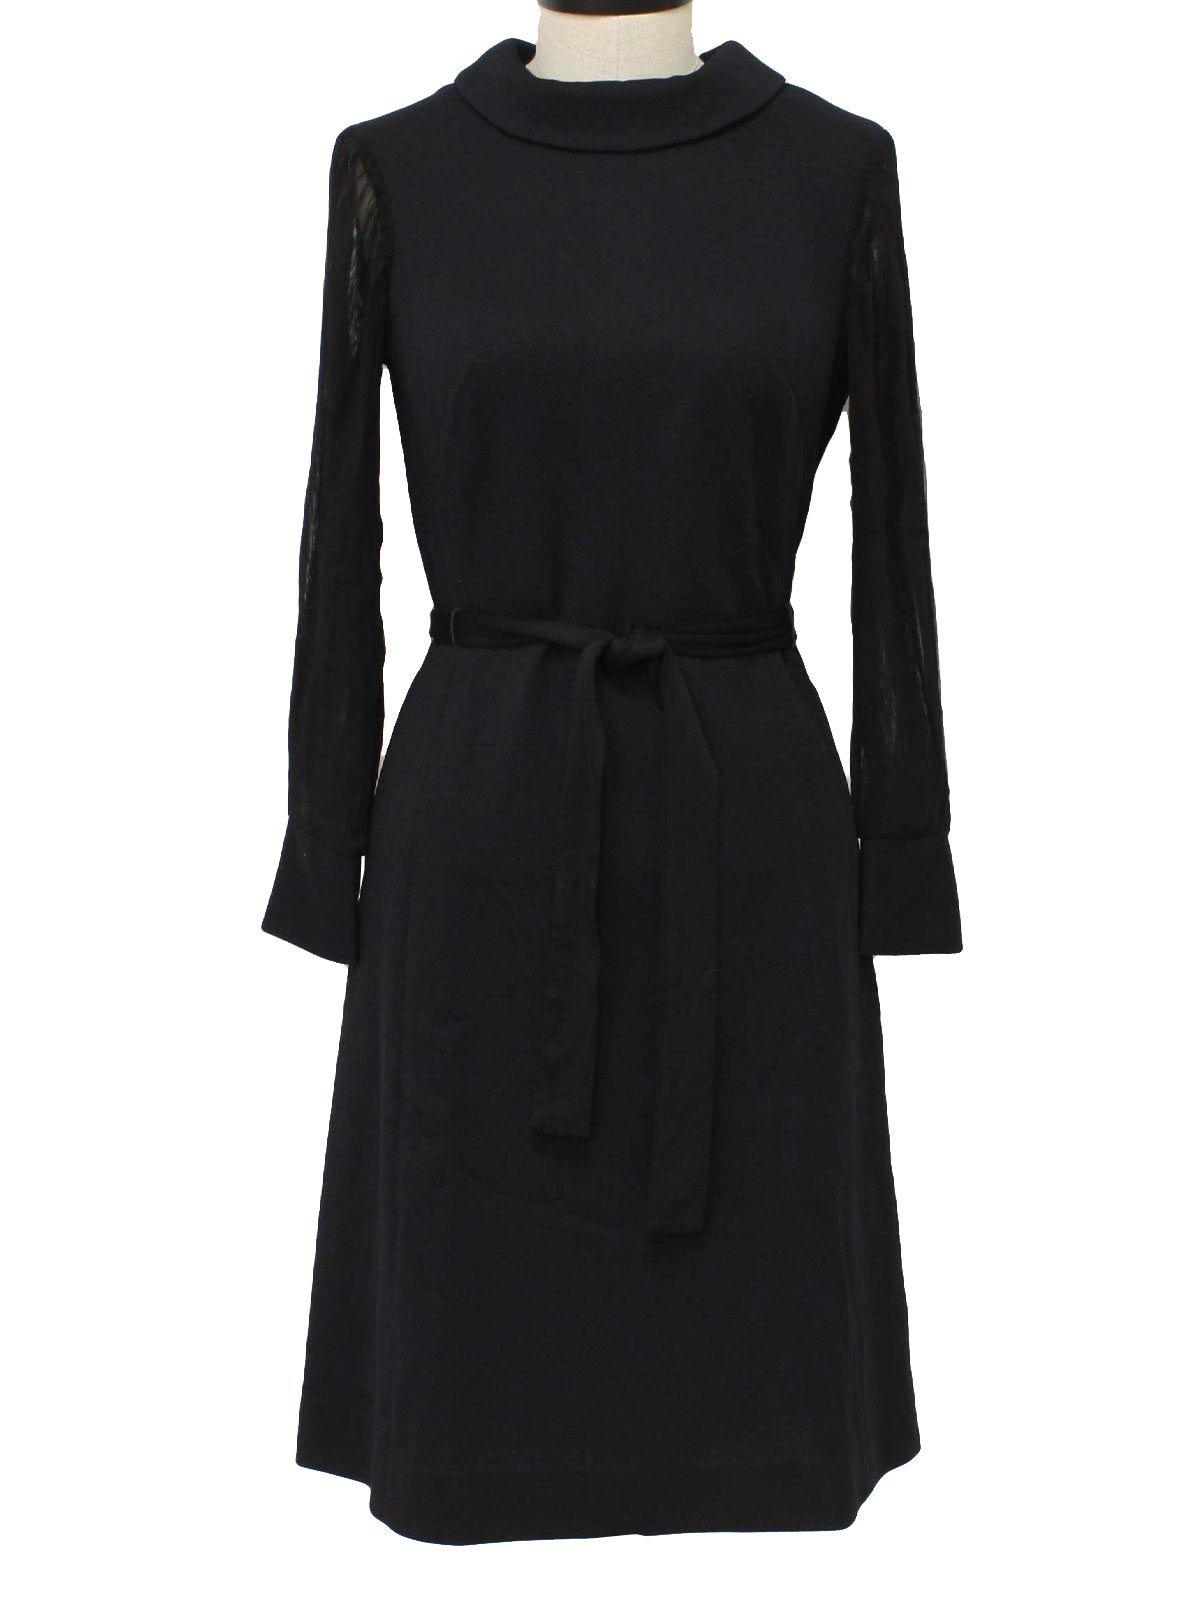 RustyZipper.Com Vintage Clothing  Little black dress, Black